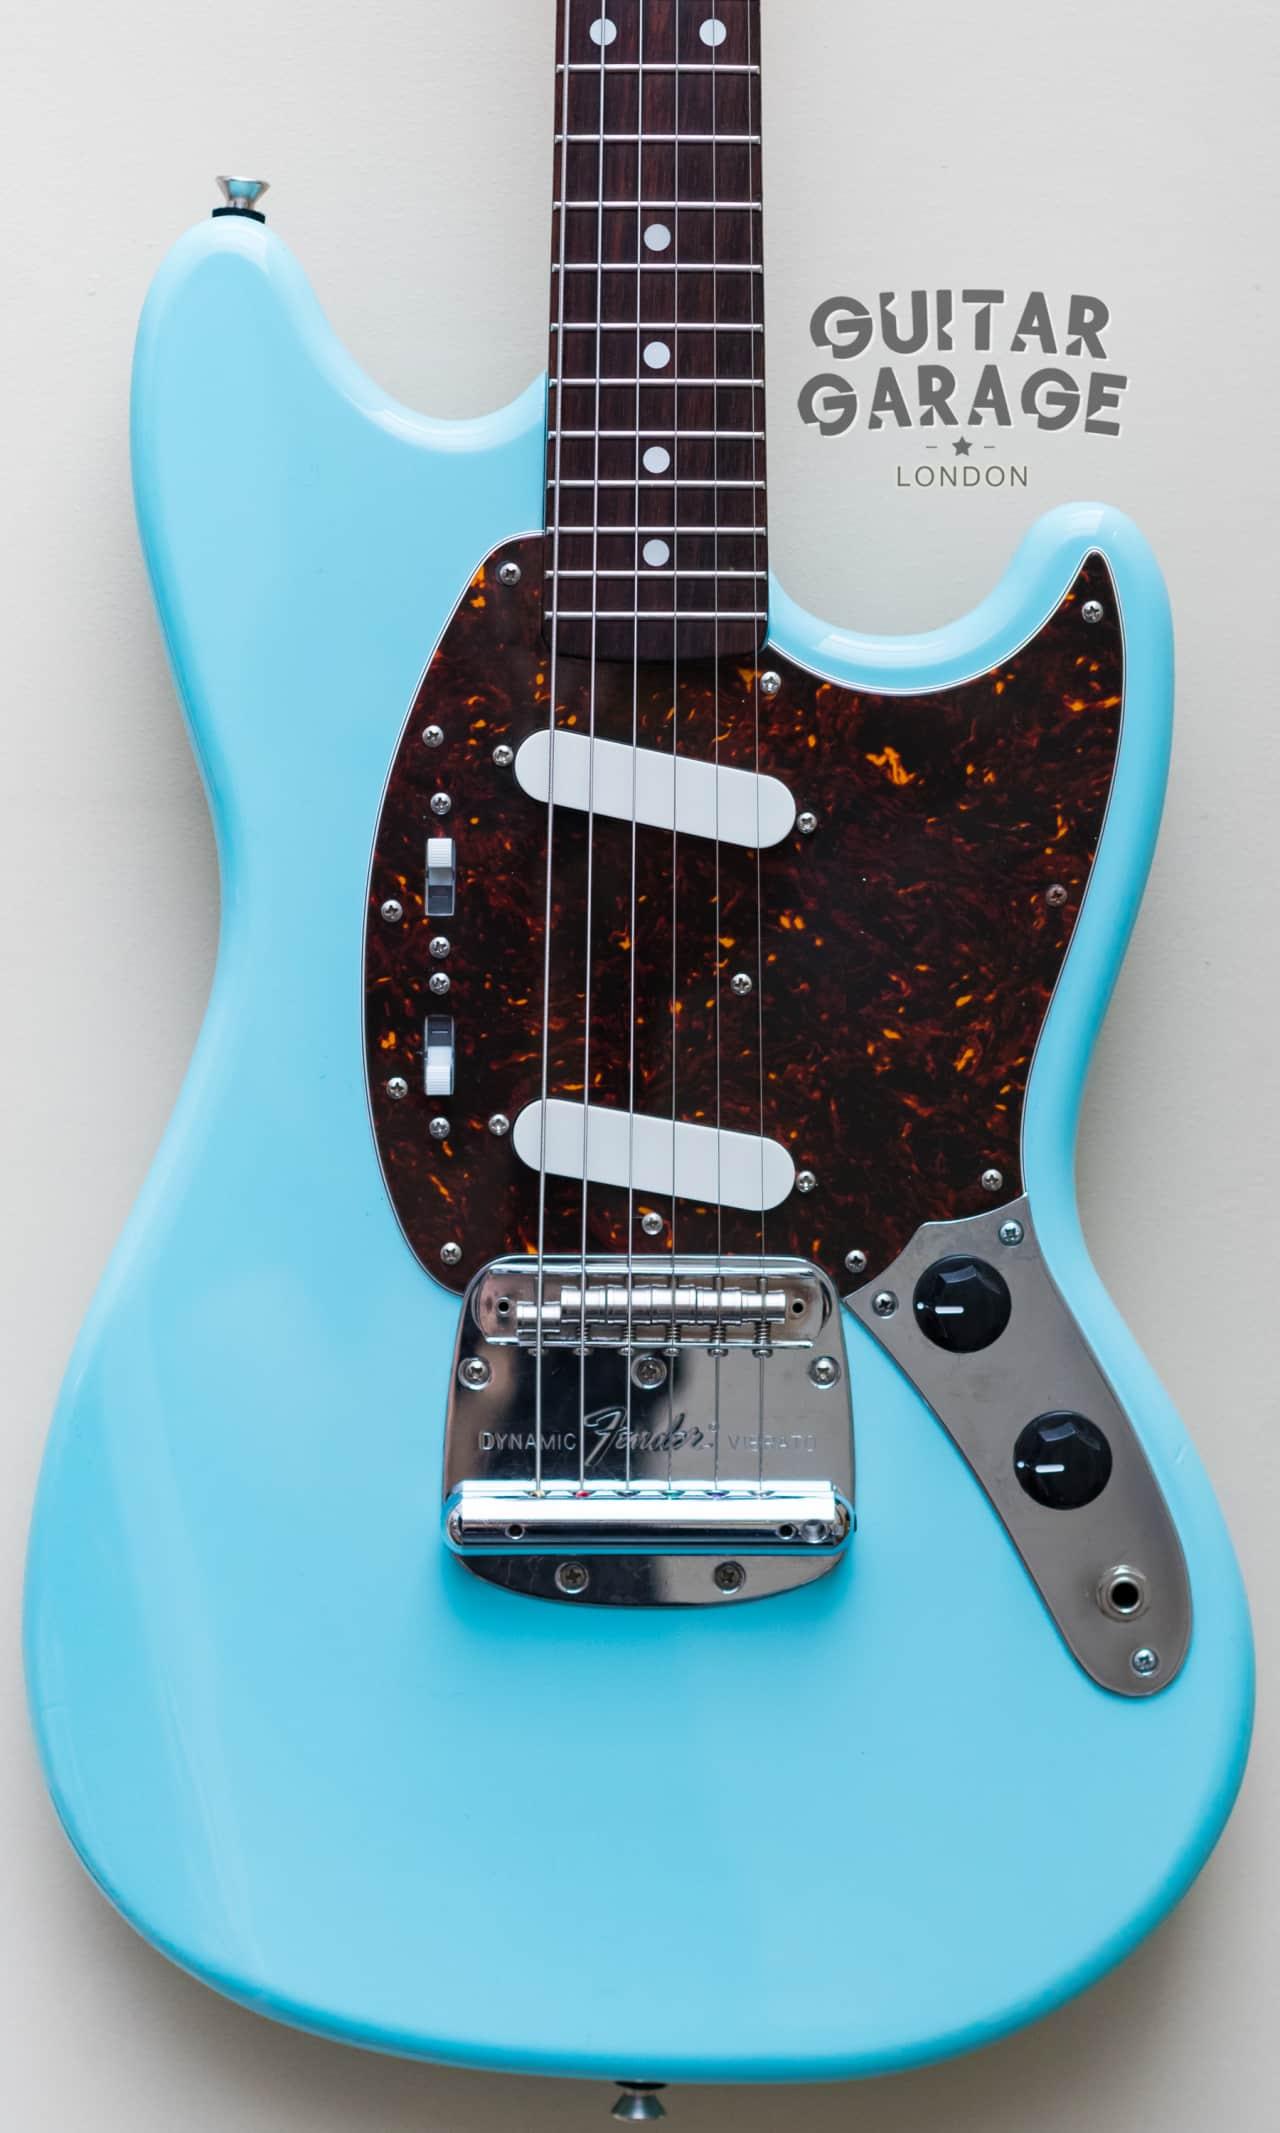 2004 Fender Japan Mustang 69 Vintage Reissue Daphne Blue | Reverb